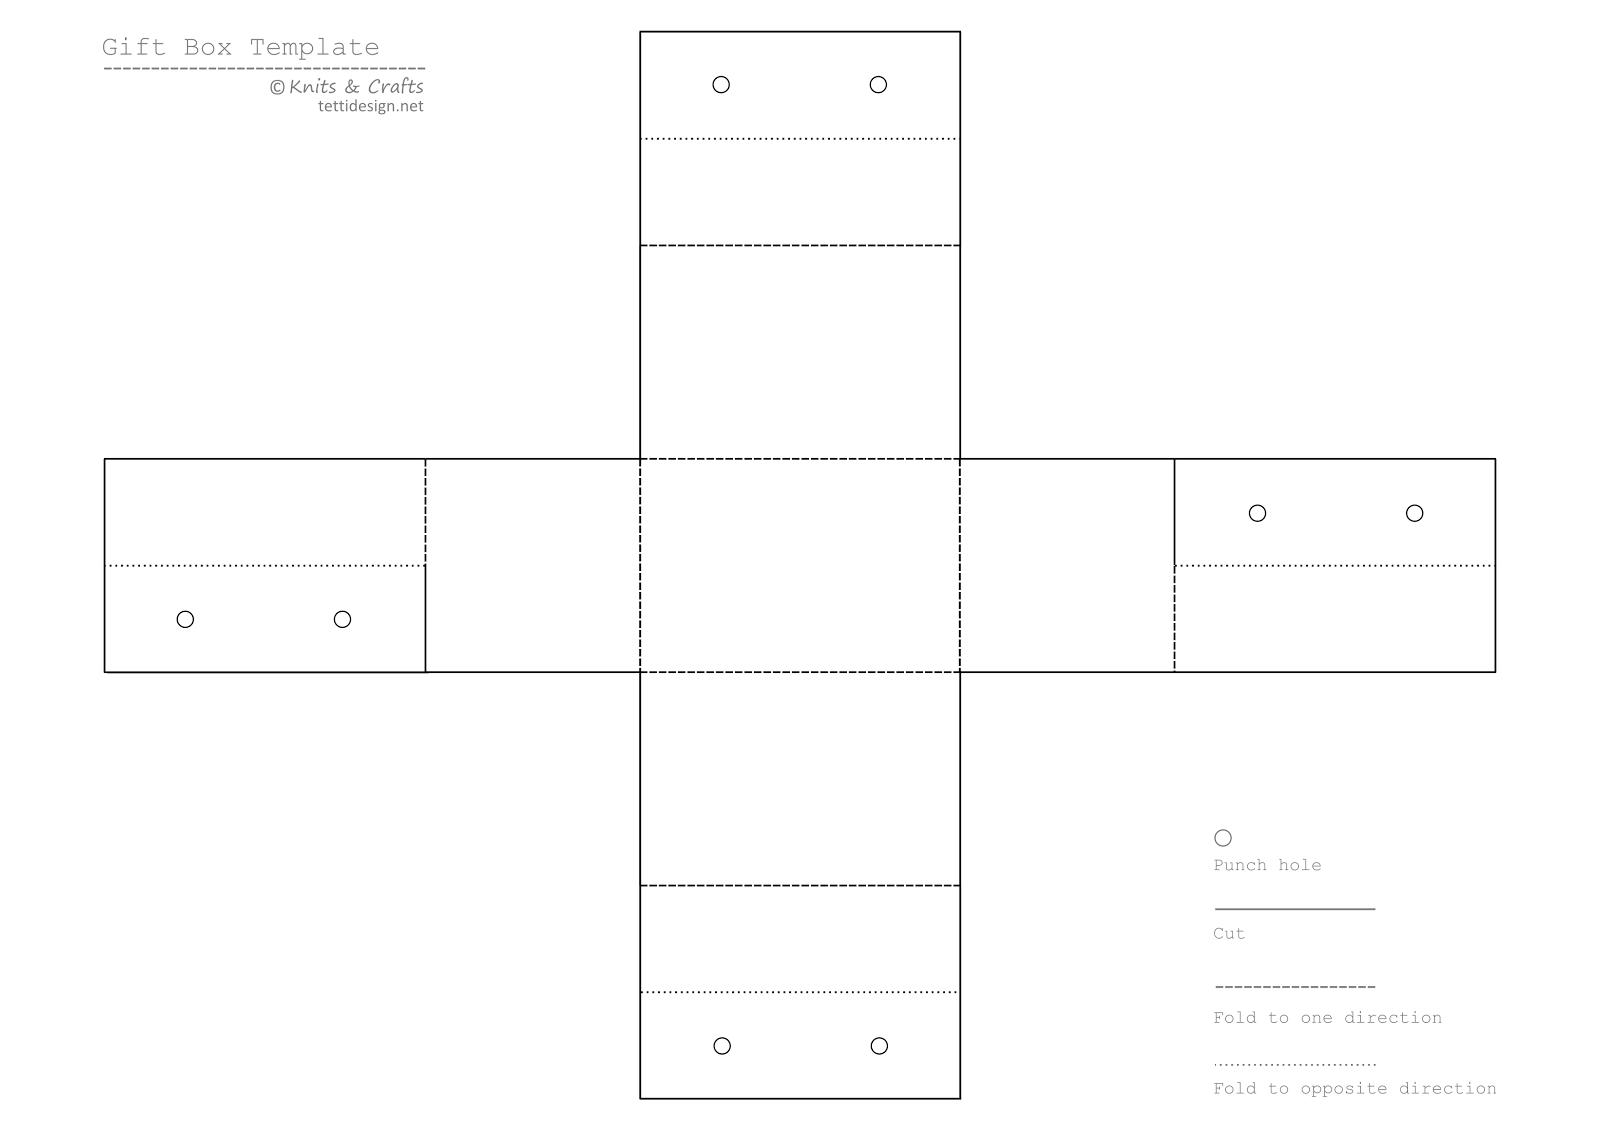 Paper Box Template. 14 paper box templates free pdf documents ...